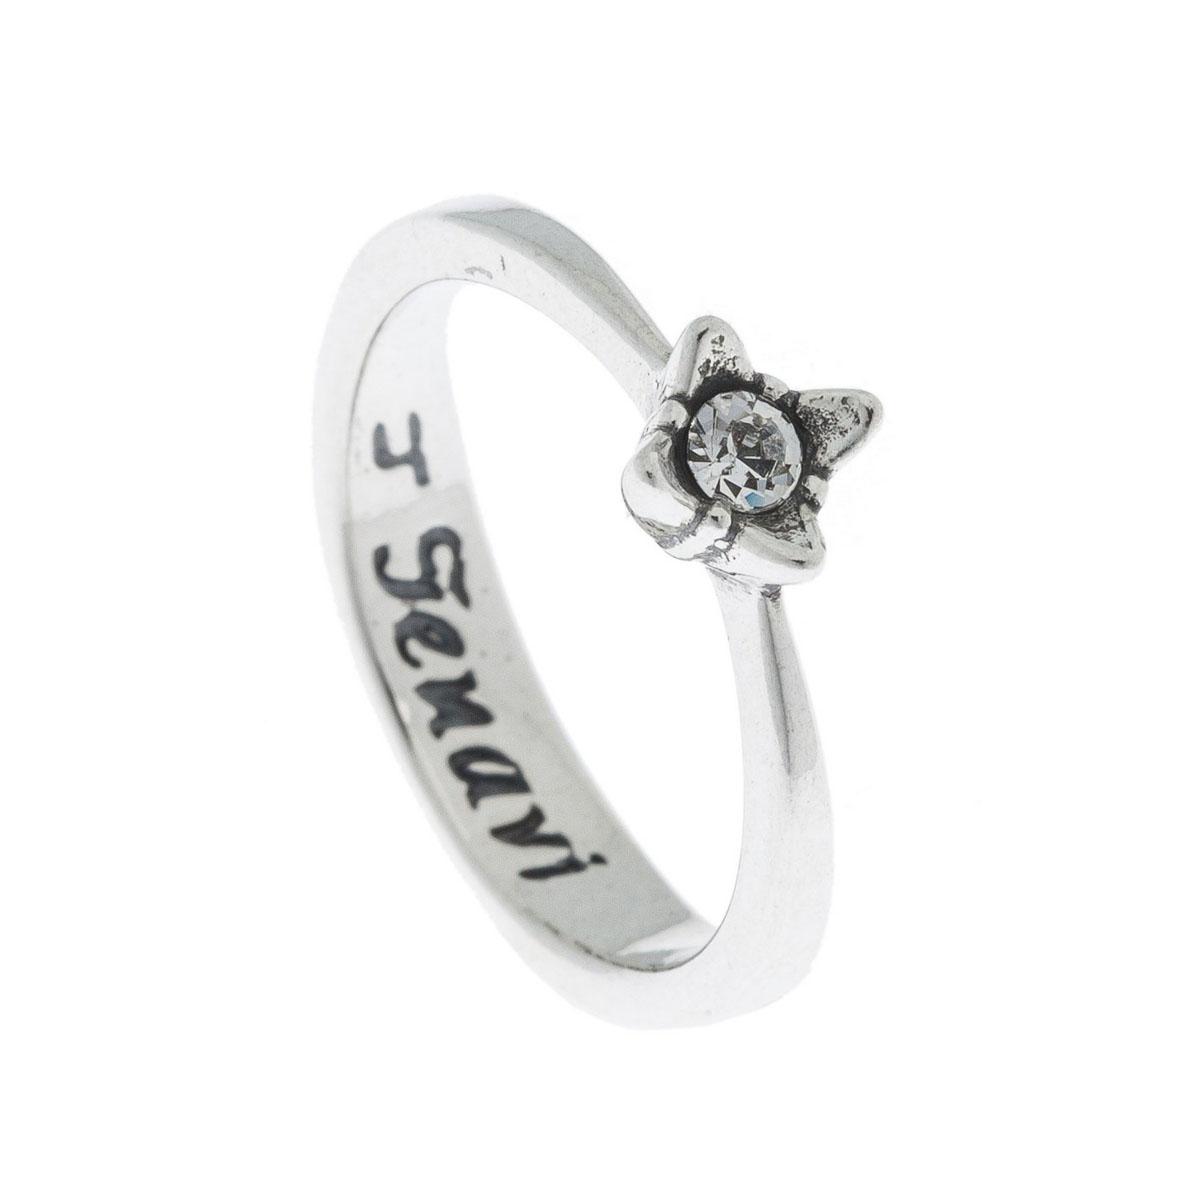 Кольцо Jenavi Эси, цвет: серебро, белый. k4993000. Размер 16k4993000Коллекция Э, Эси (Кольцо) гипоаллергенный ювелирный сплав,Черненое серебро, вставка Кристаллы Swarovski